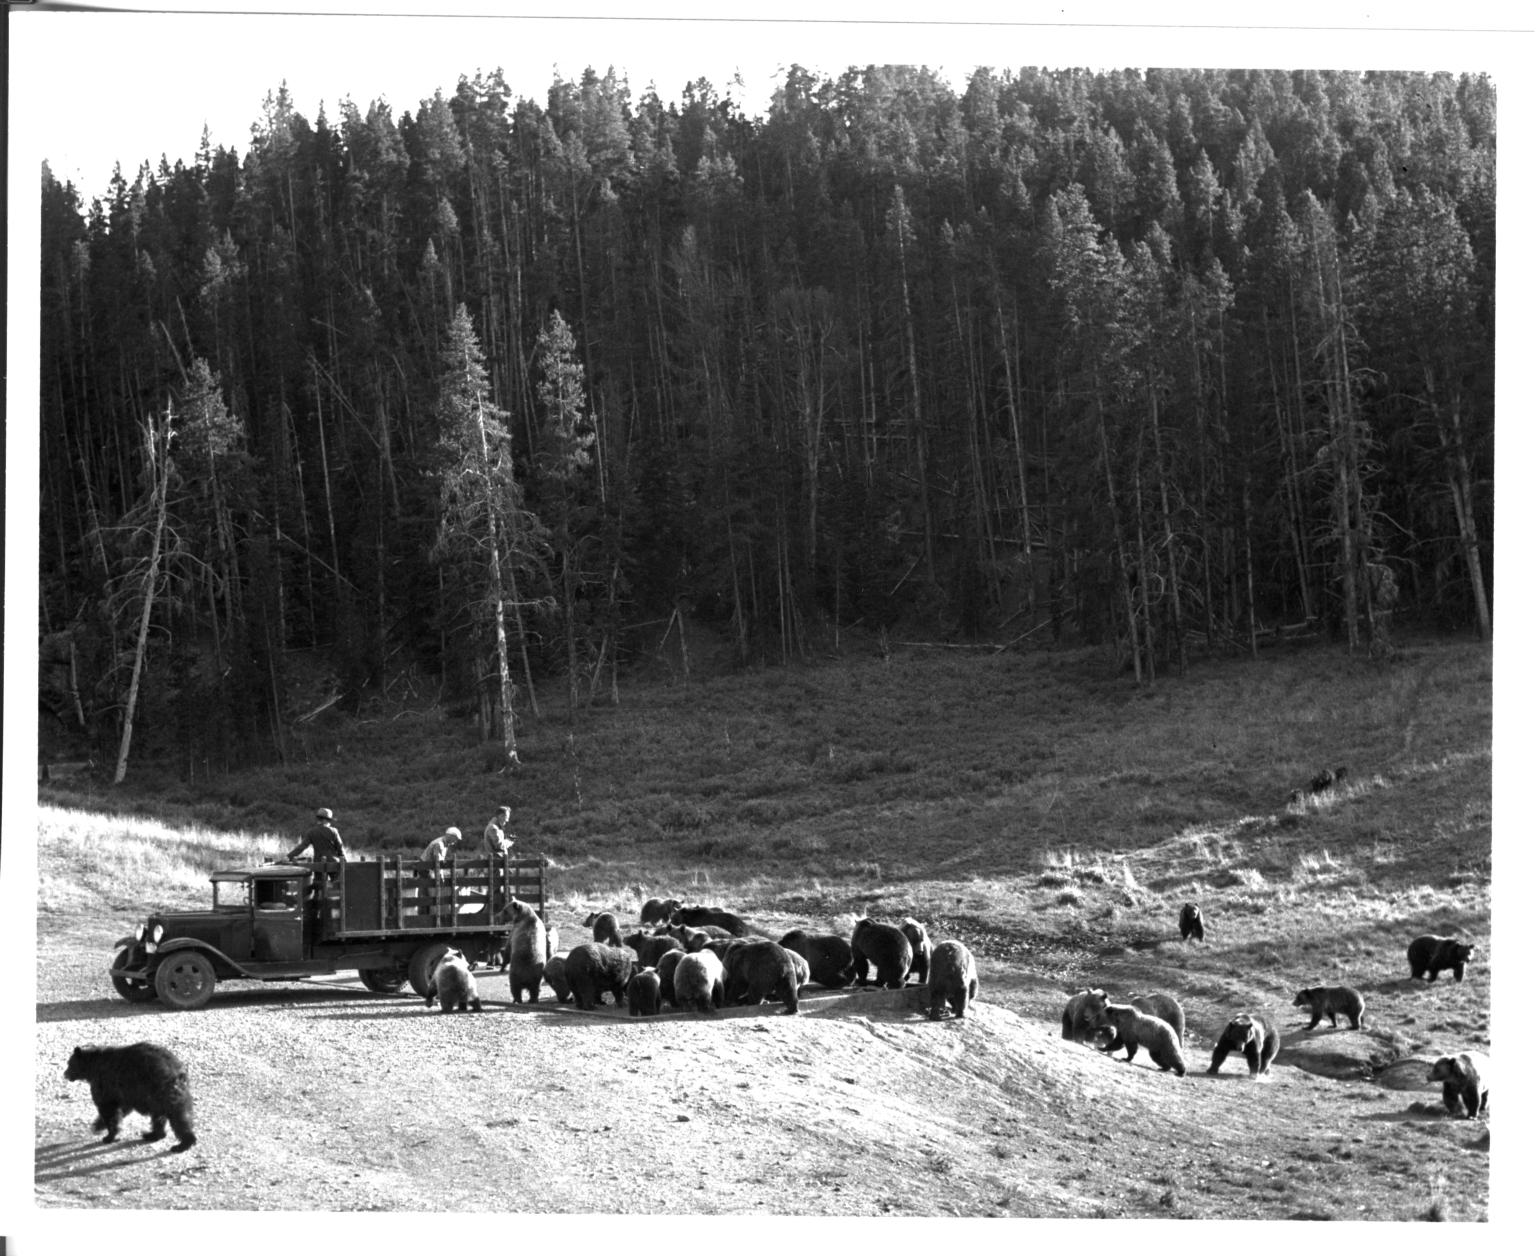 Feeding grizzly bears